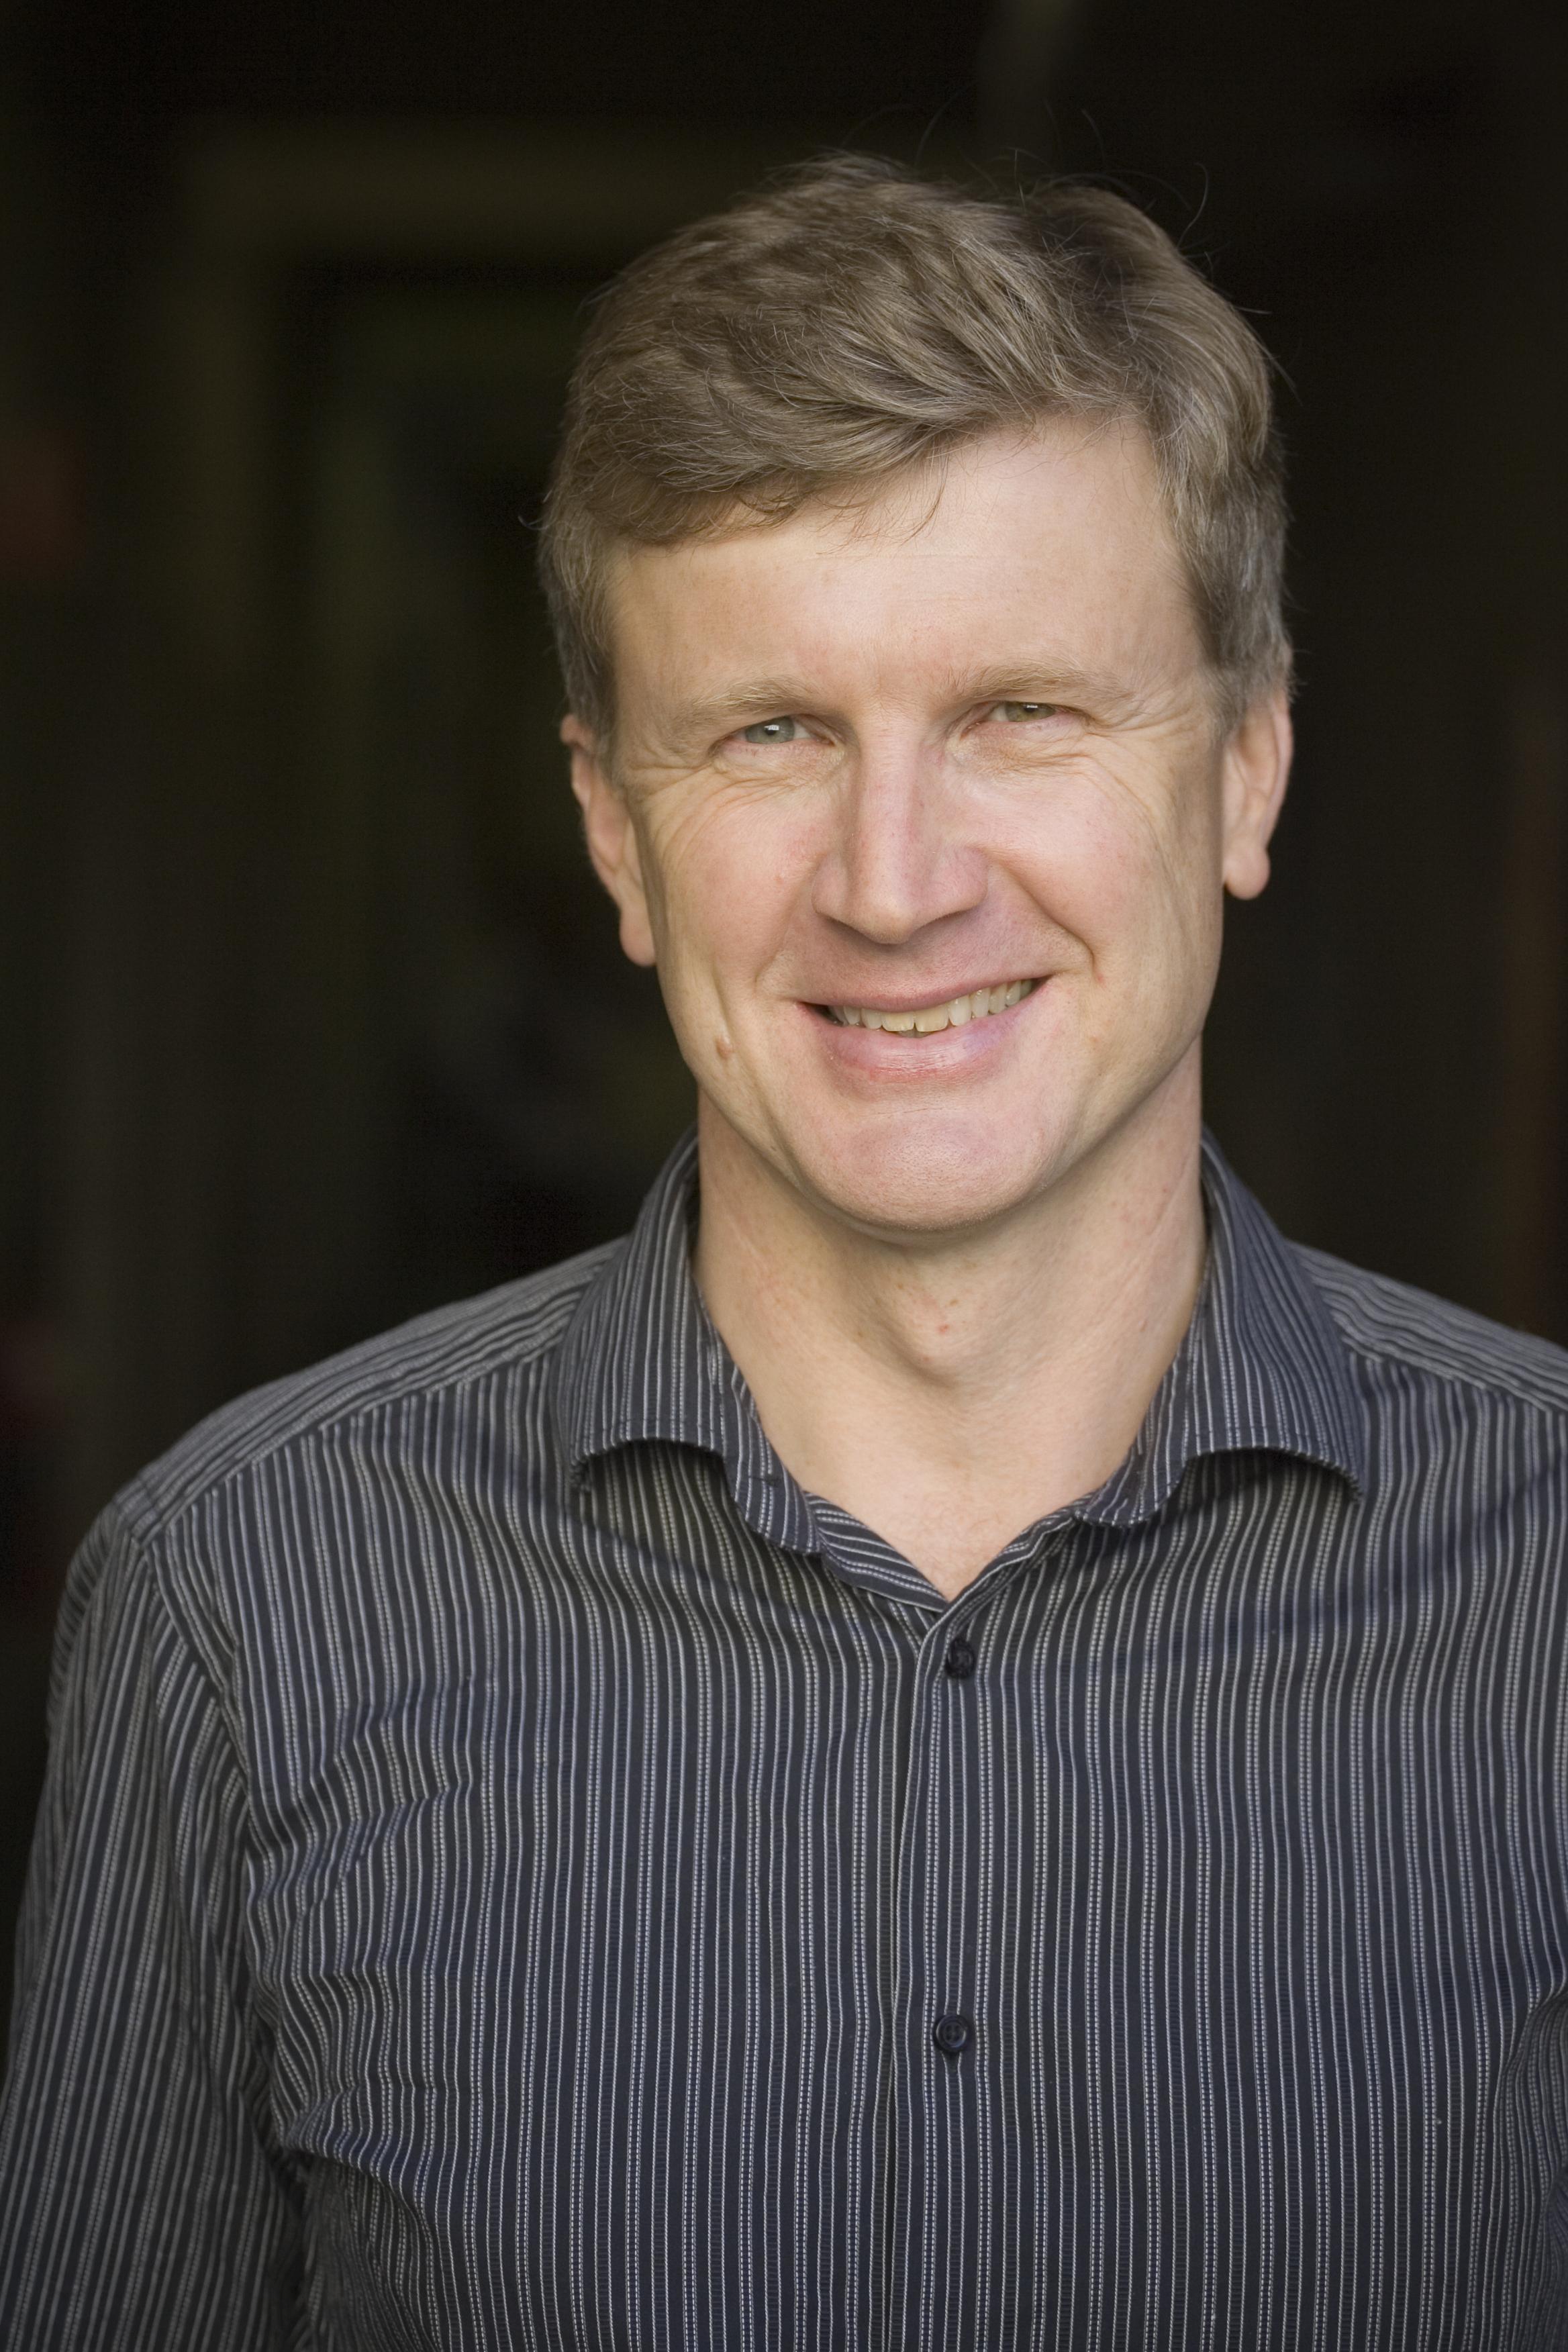 Professor Jonathan Bland-Hawthorn